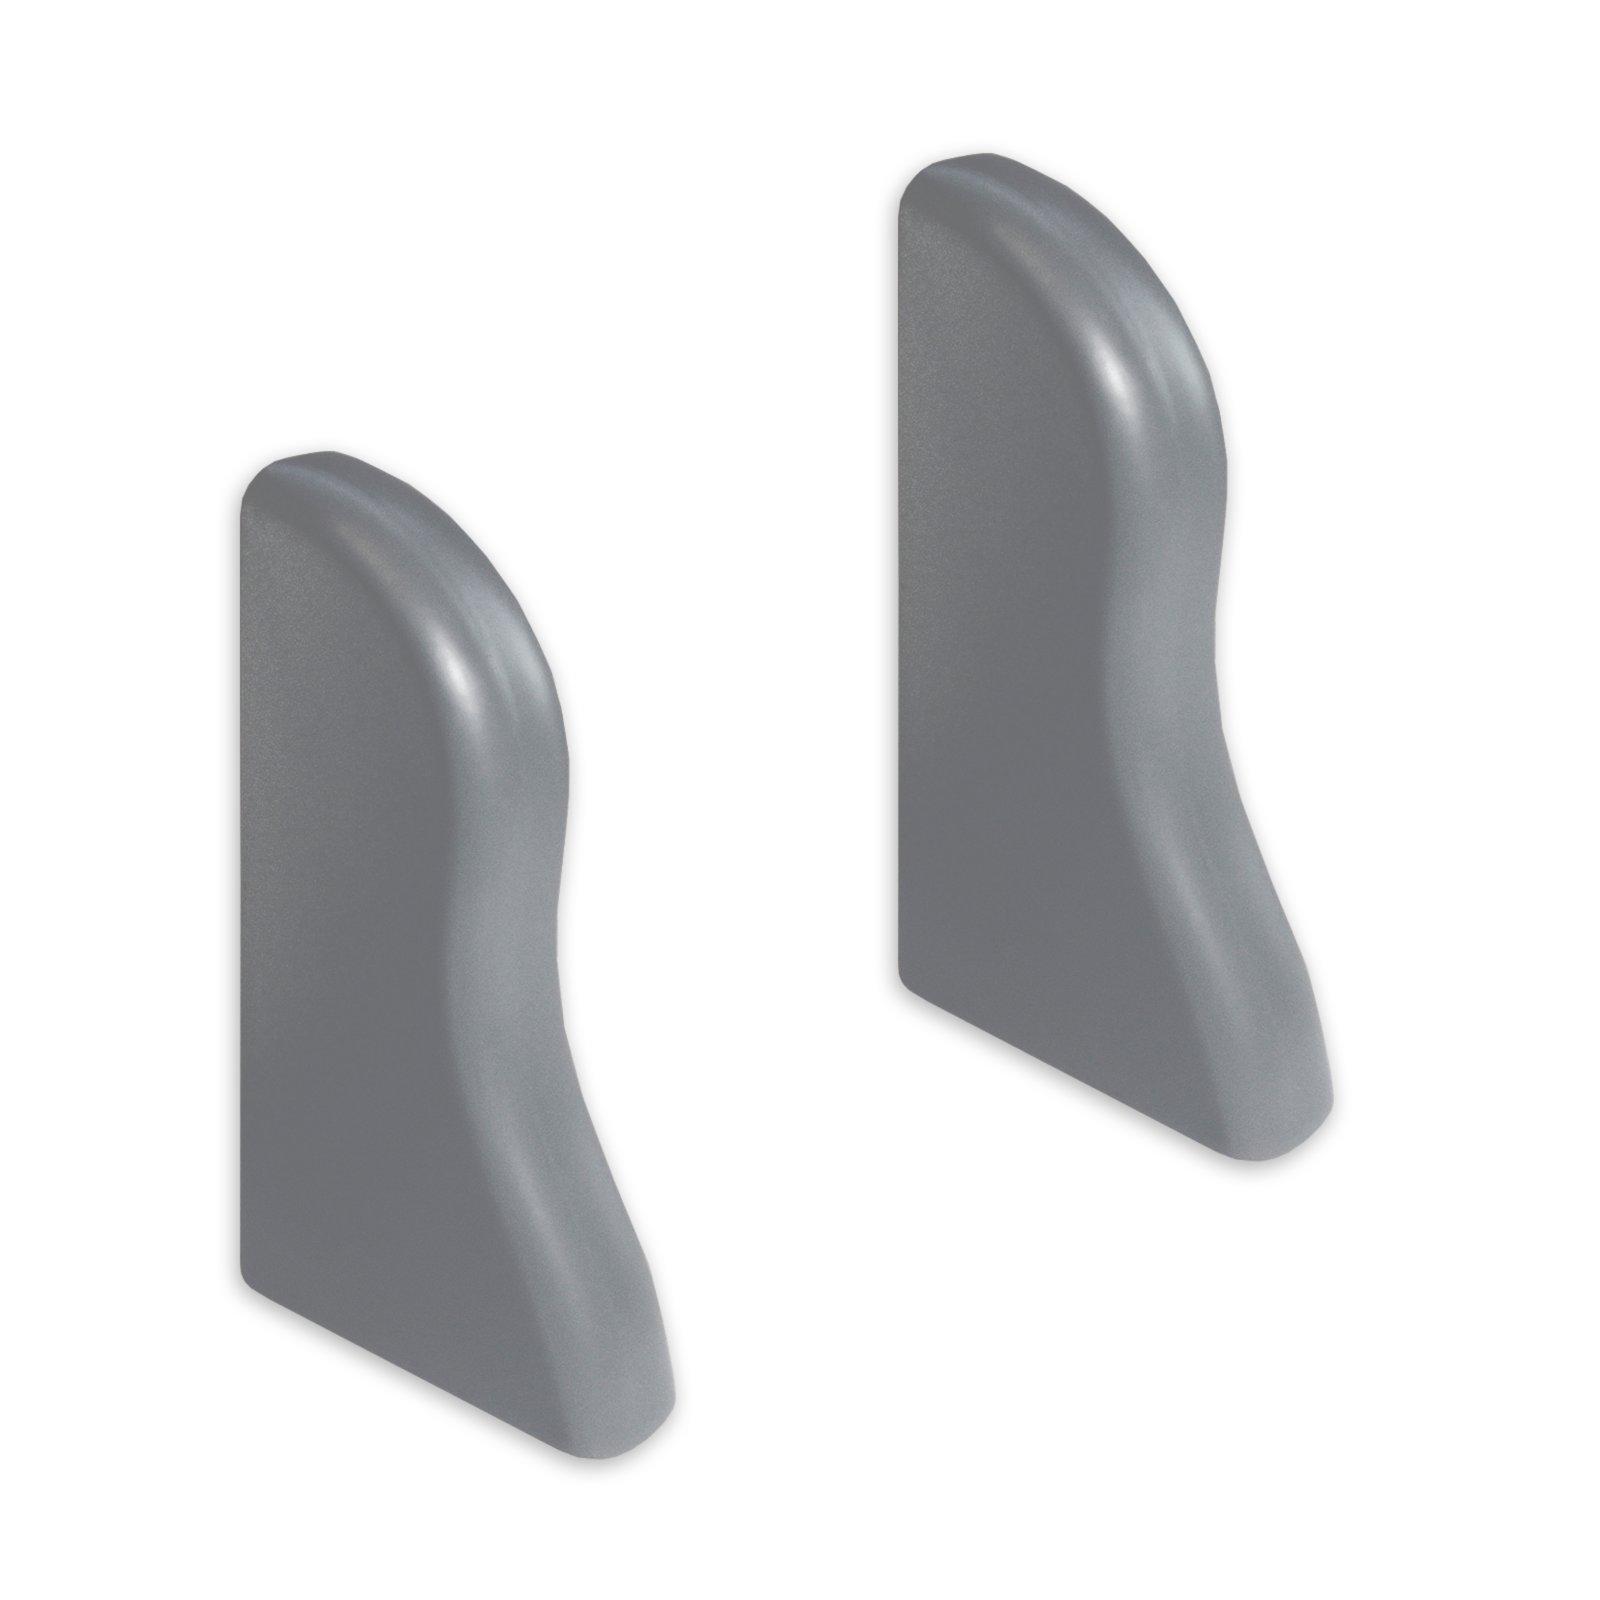 2 Endkappen K40 - silber dunkel - für Sockelleisten - 40x22 mm